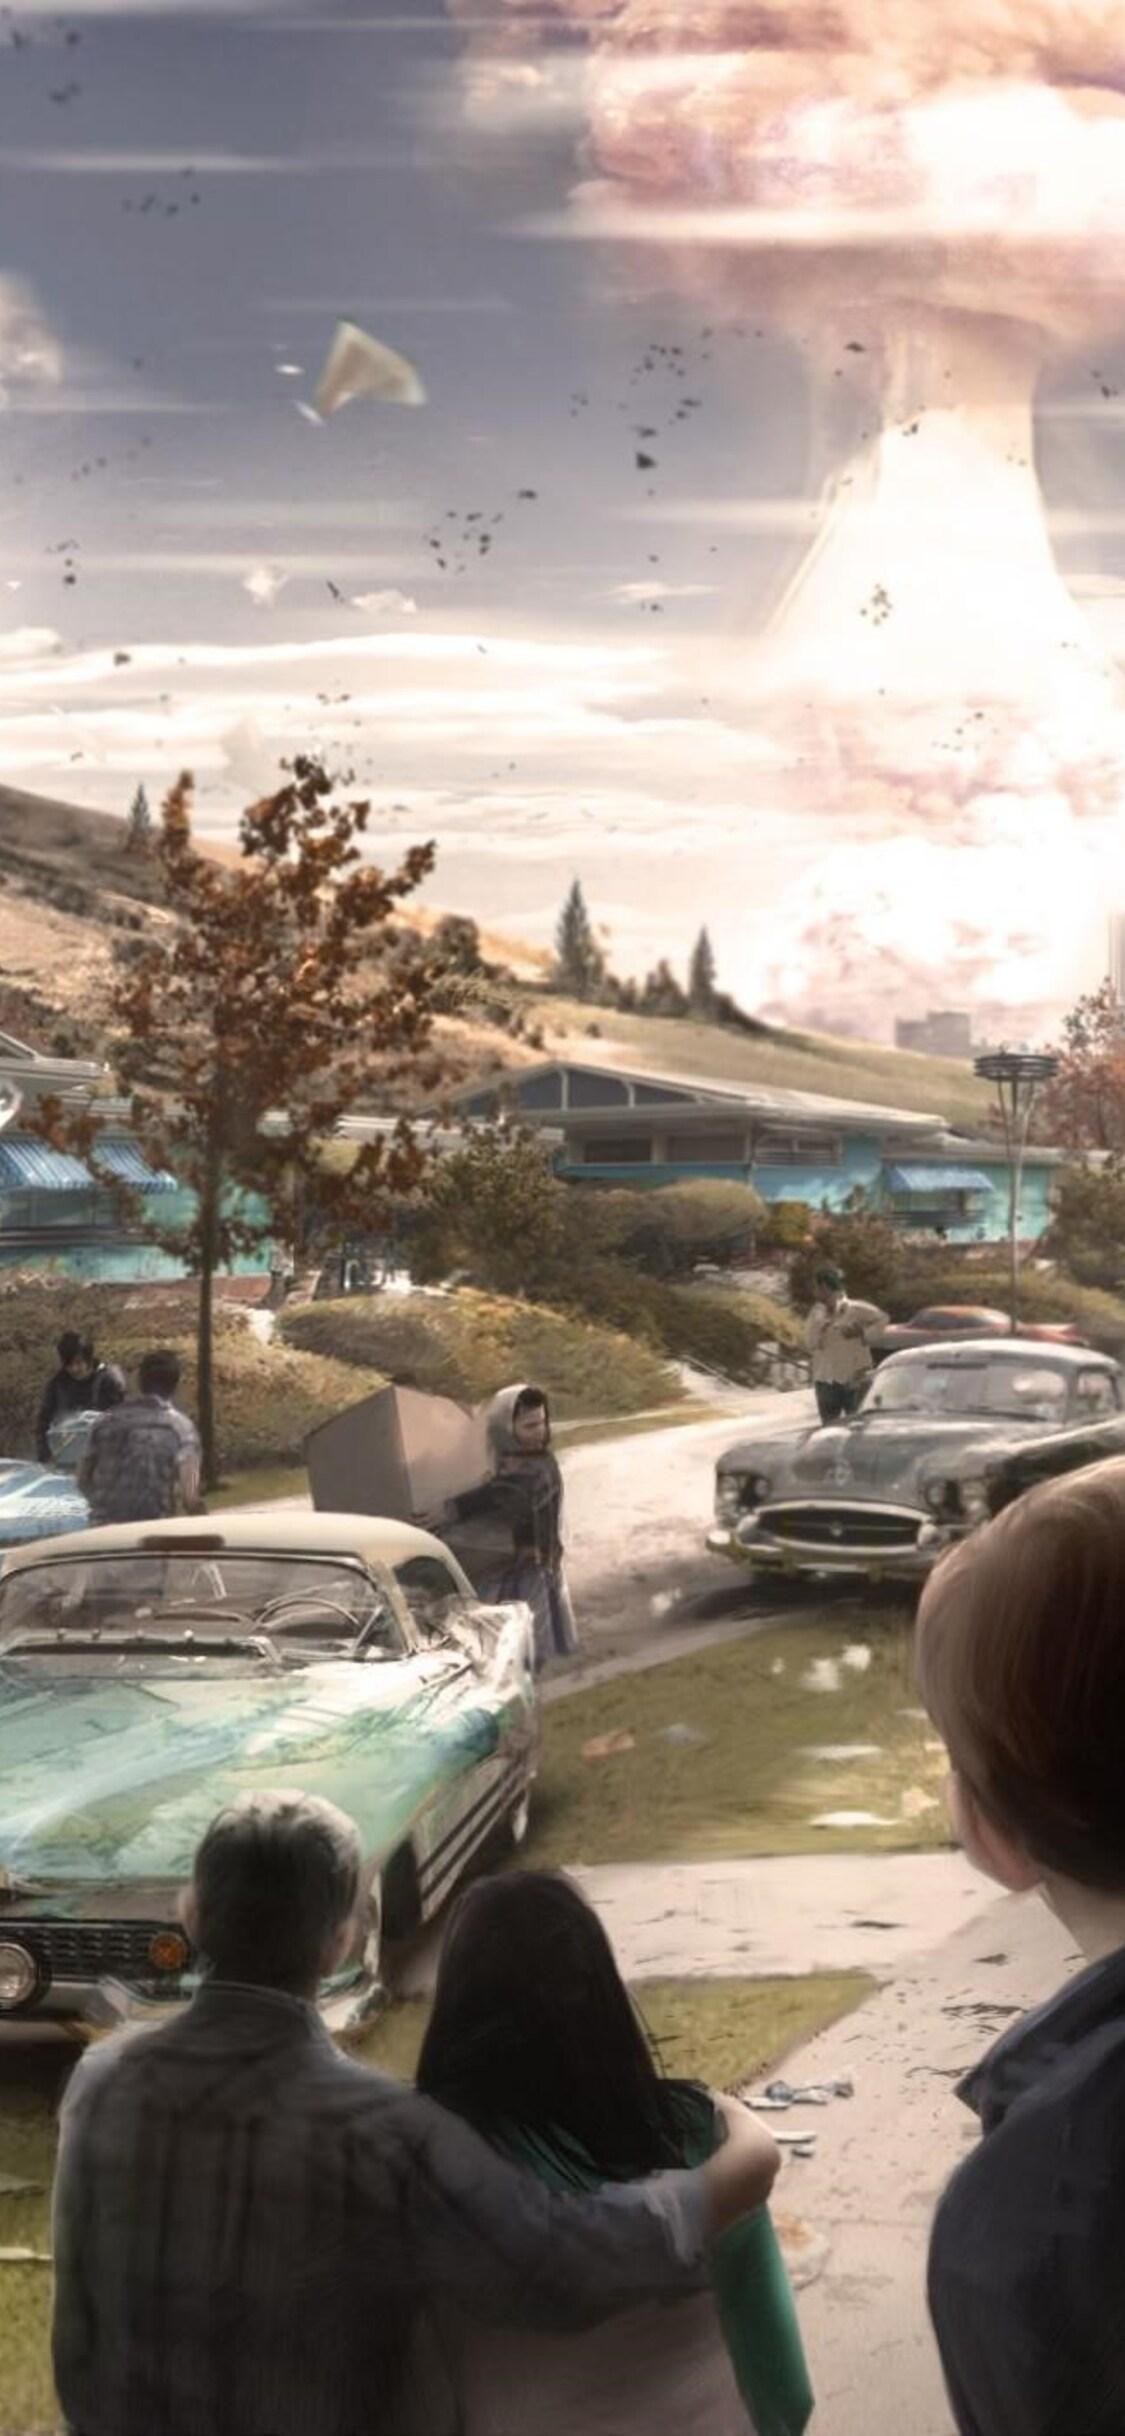 Fallout 4 Wallpaper Iphone X Kadada Org